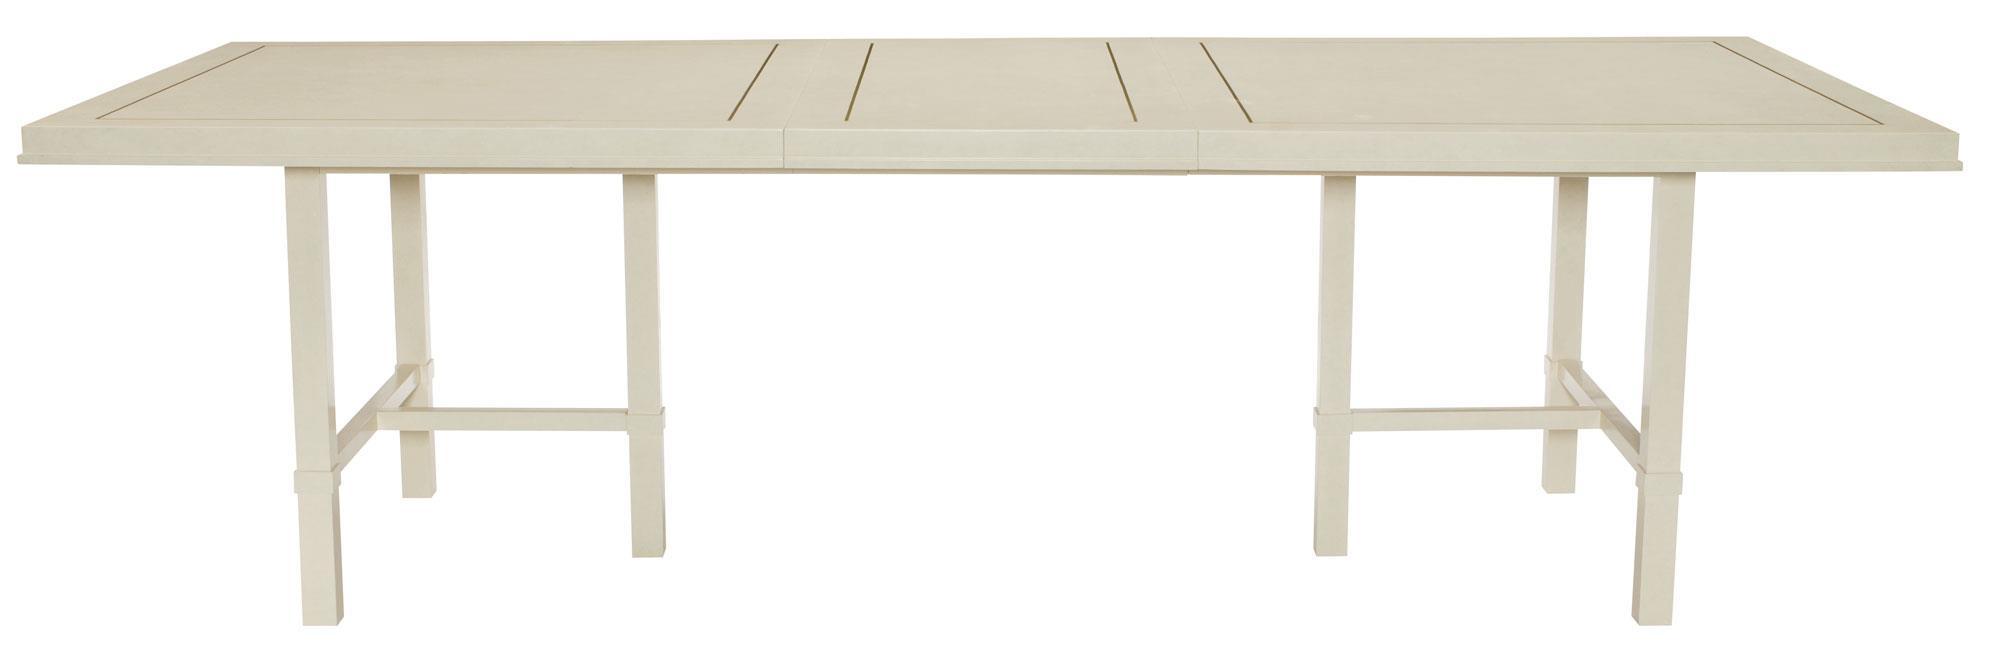 Bernhardt Salon Dining Table - Item Number: 341-226